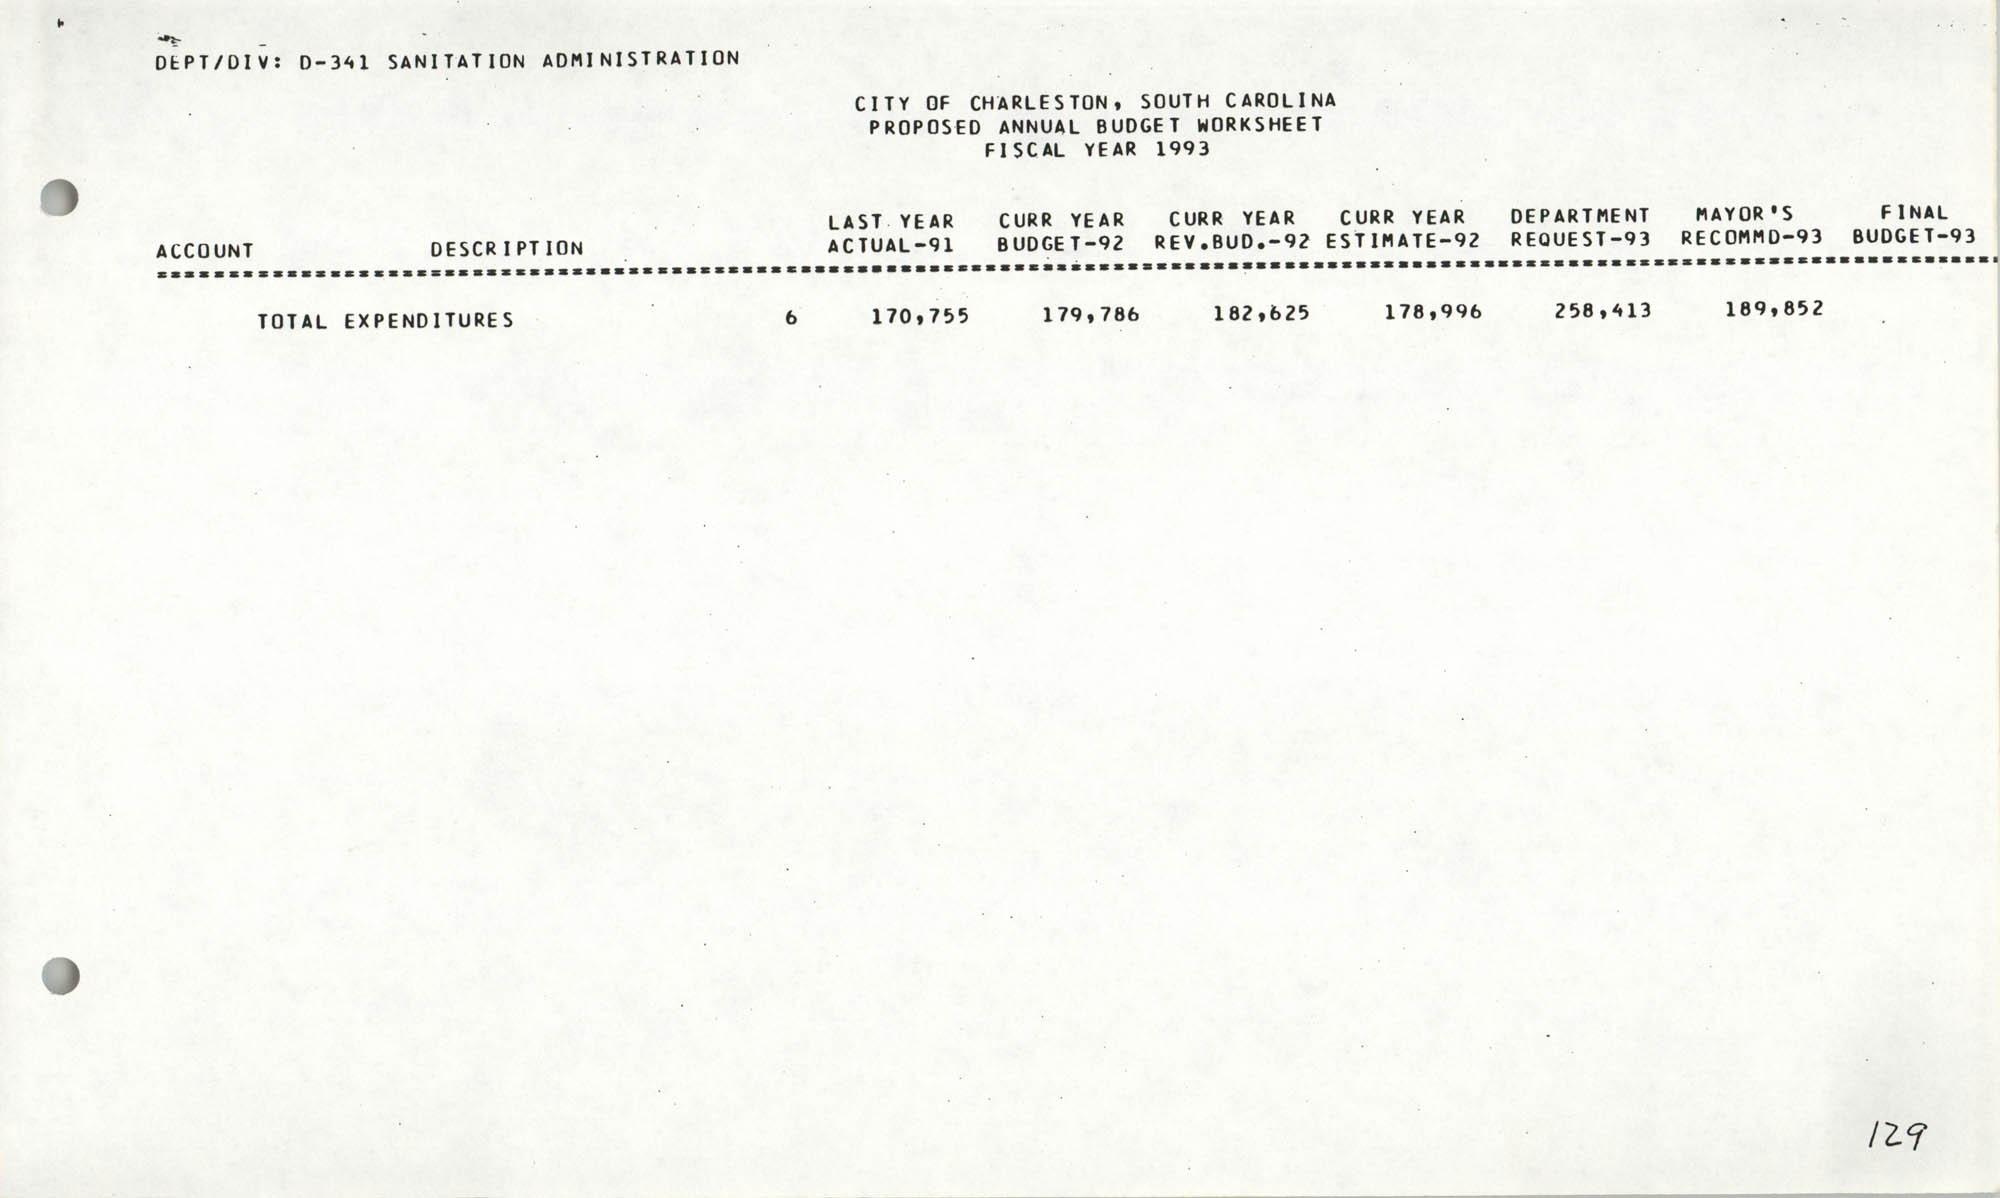 The City Council of Charleston, South Carolina, 1993 Budget, Page 129